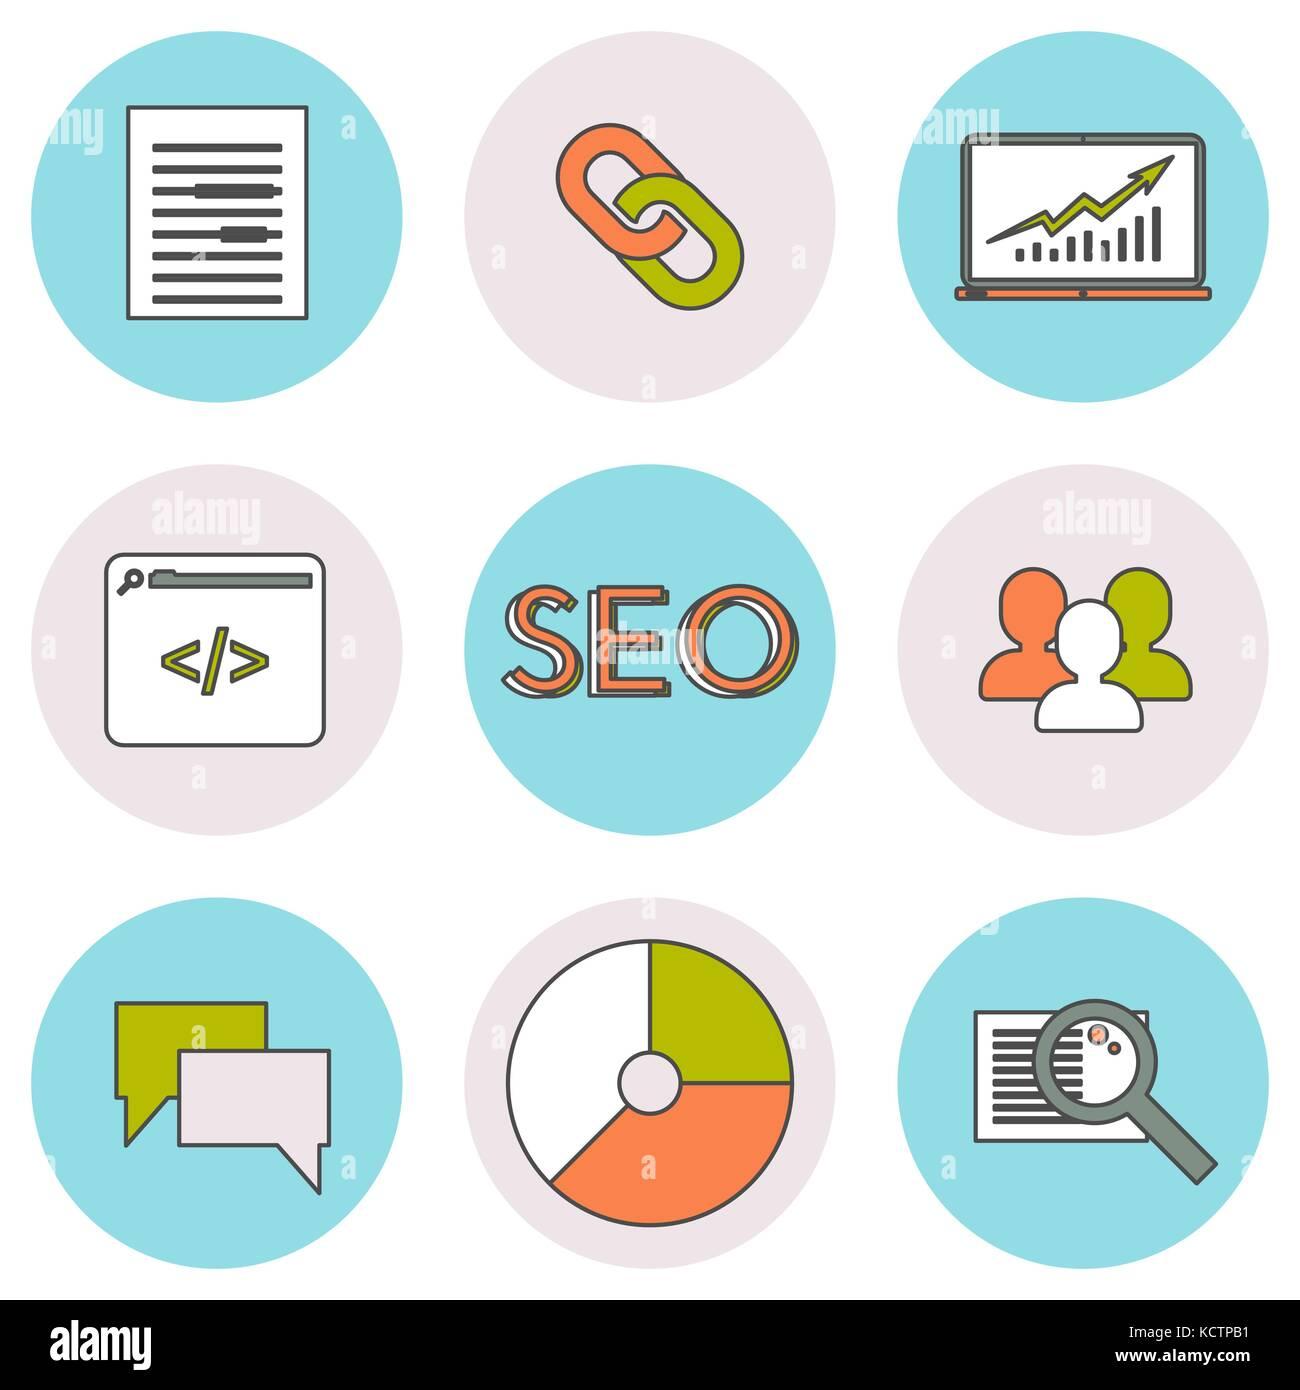 Seo Iconos de línea. Imagen De Stock